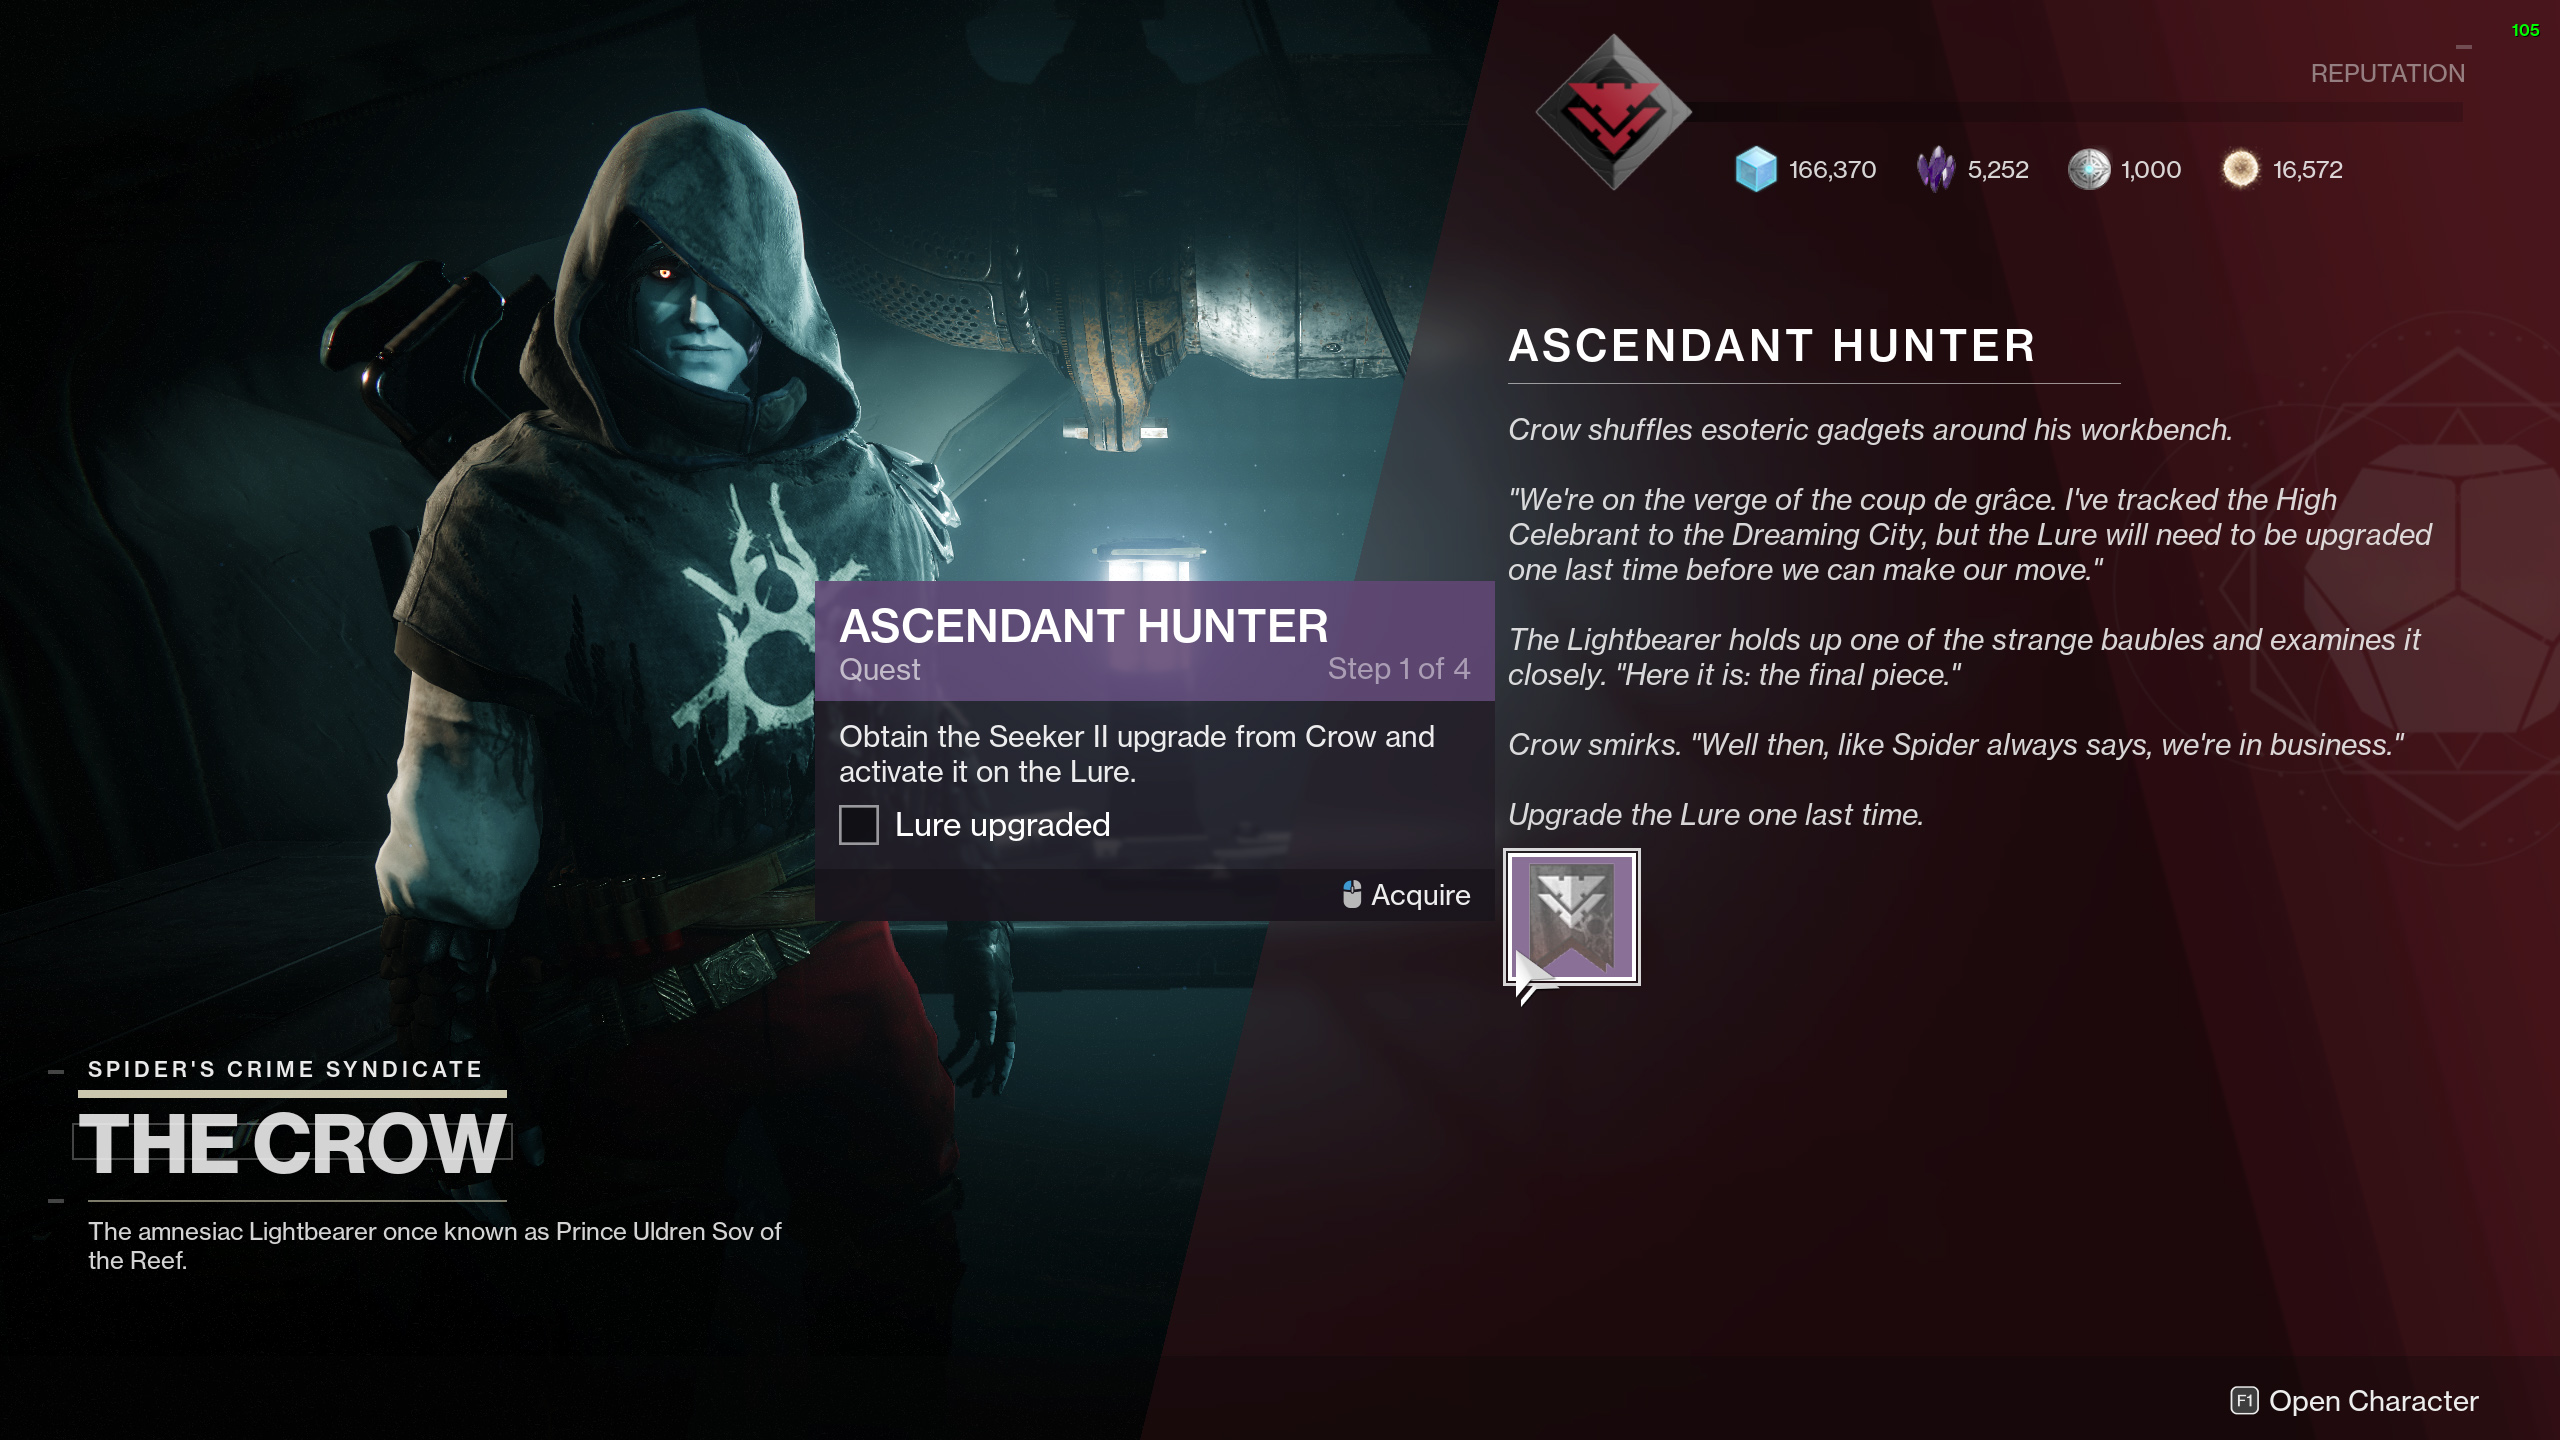 destiny 2 ascendant hunter